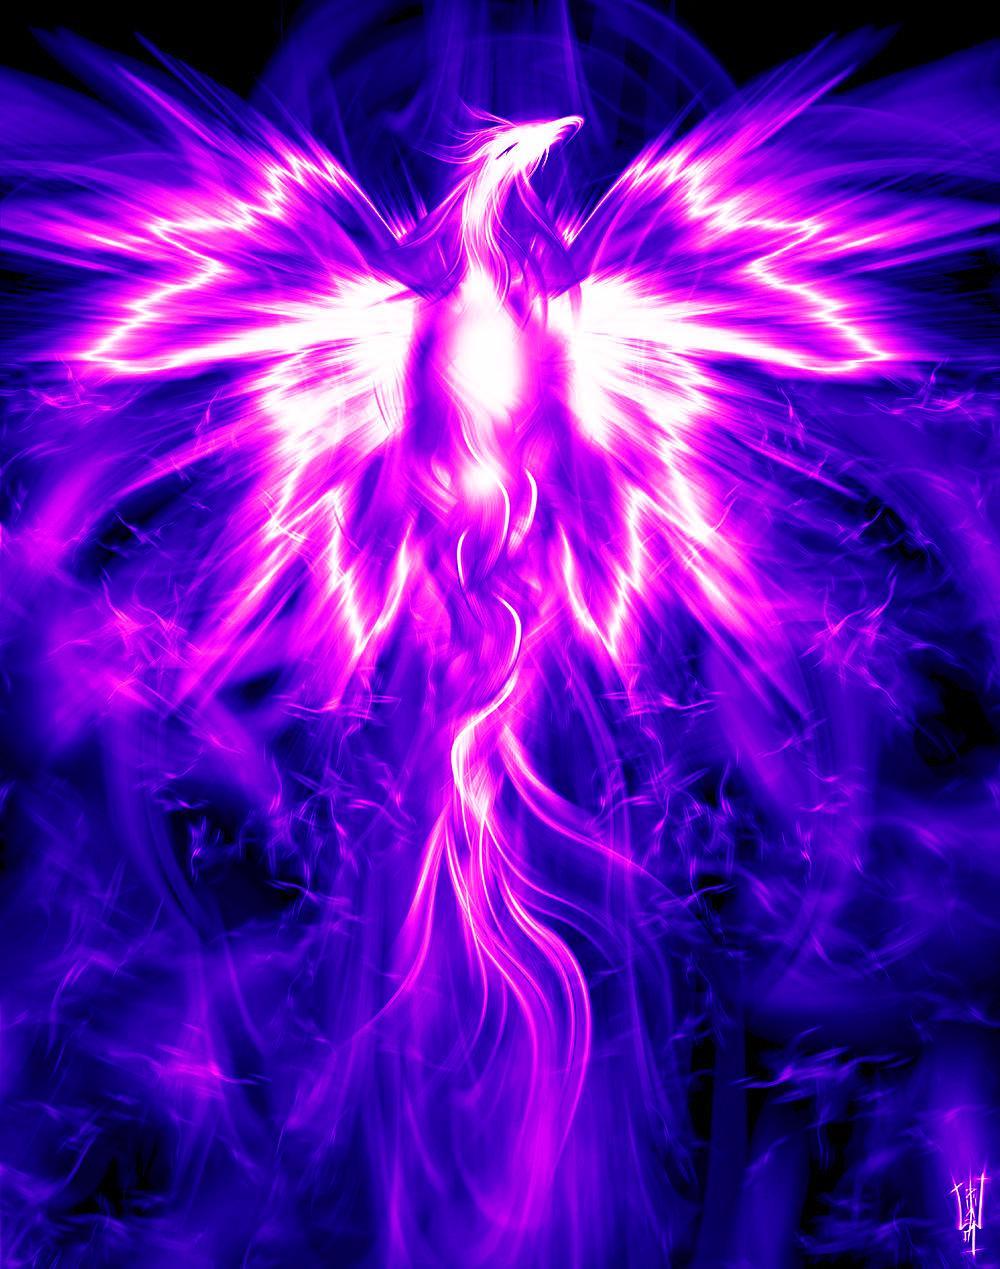 Phoenix king ben 10 fan fiction create your own omniverse - Photo de phenix ...